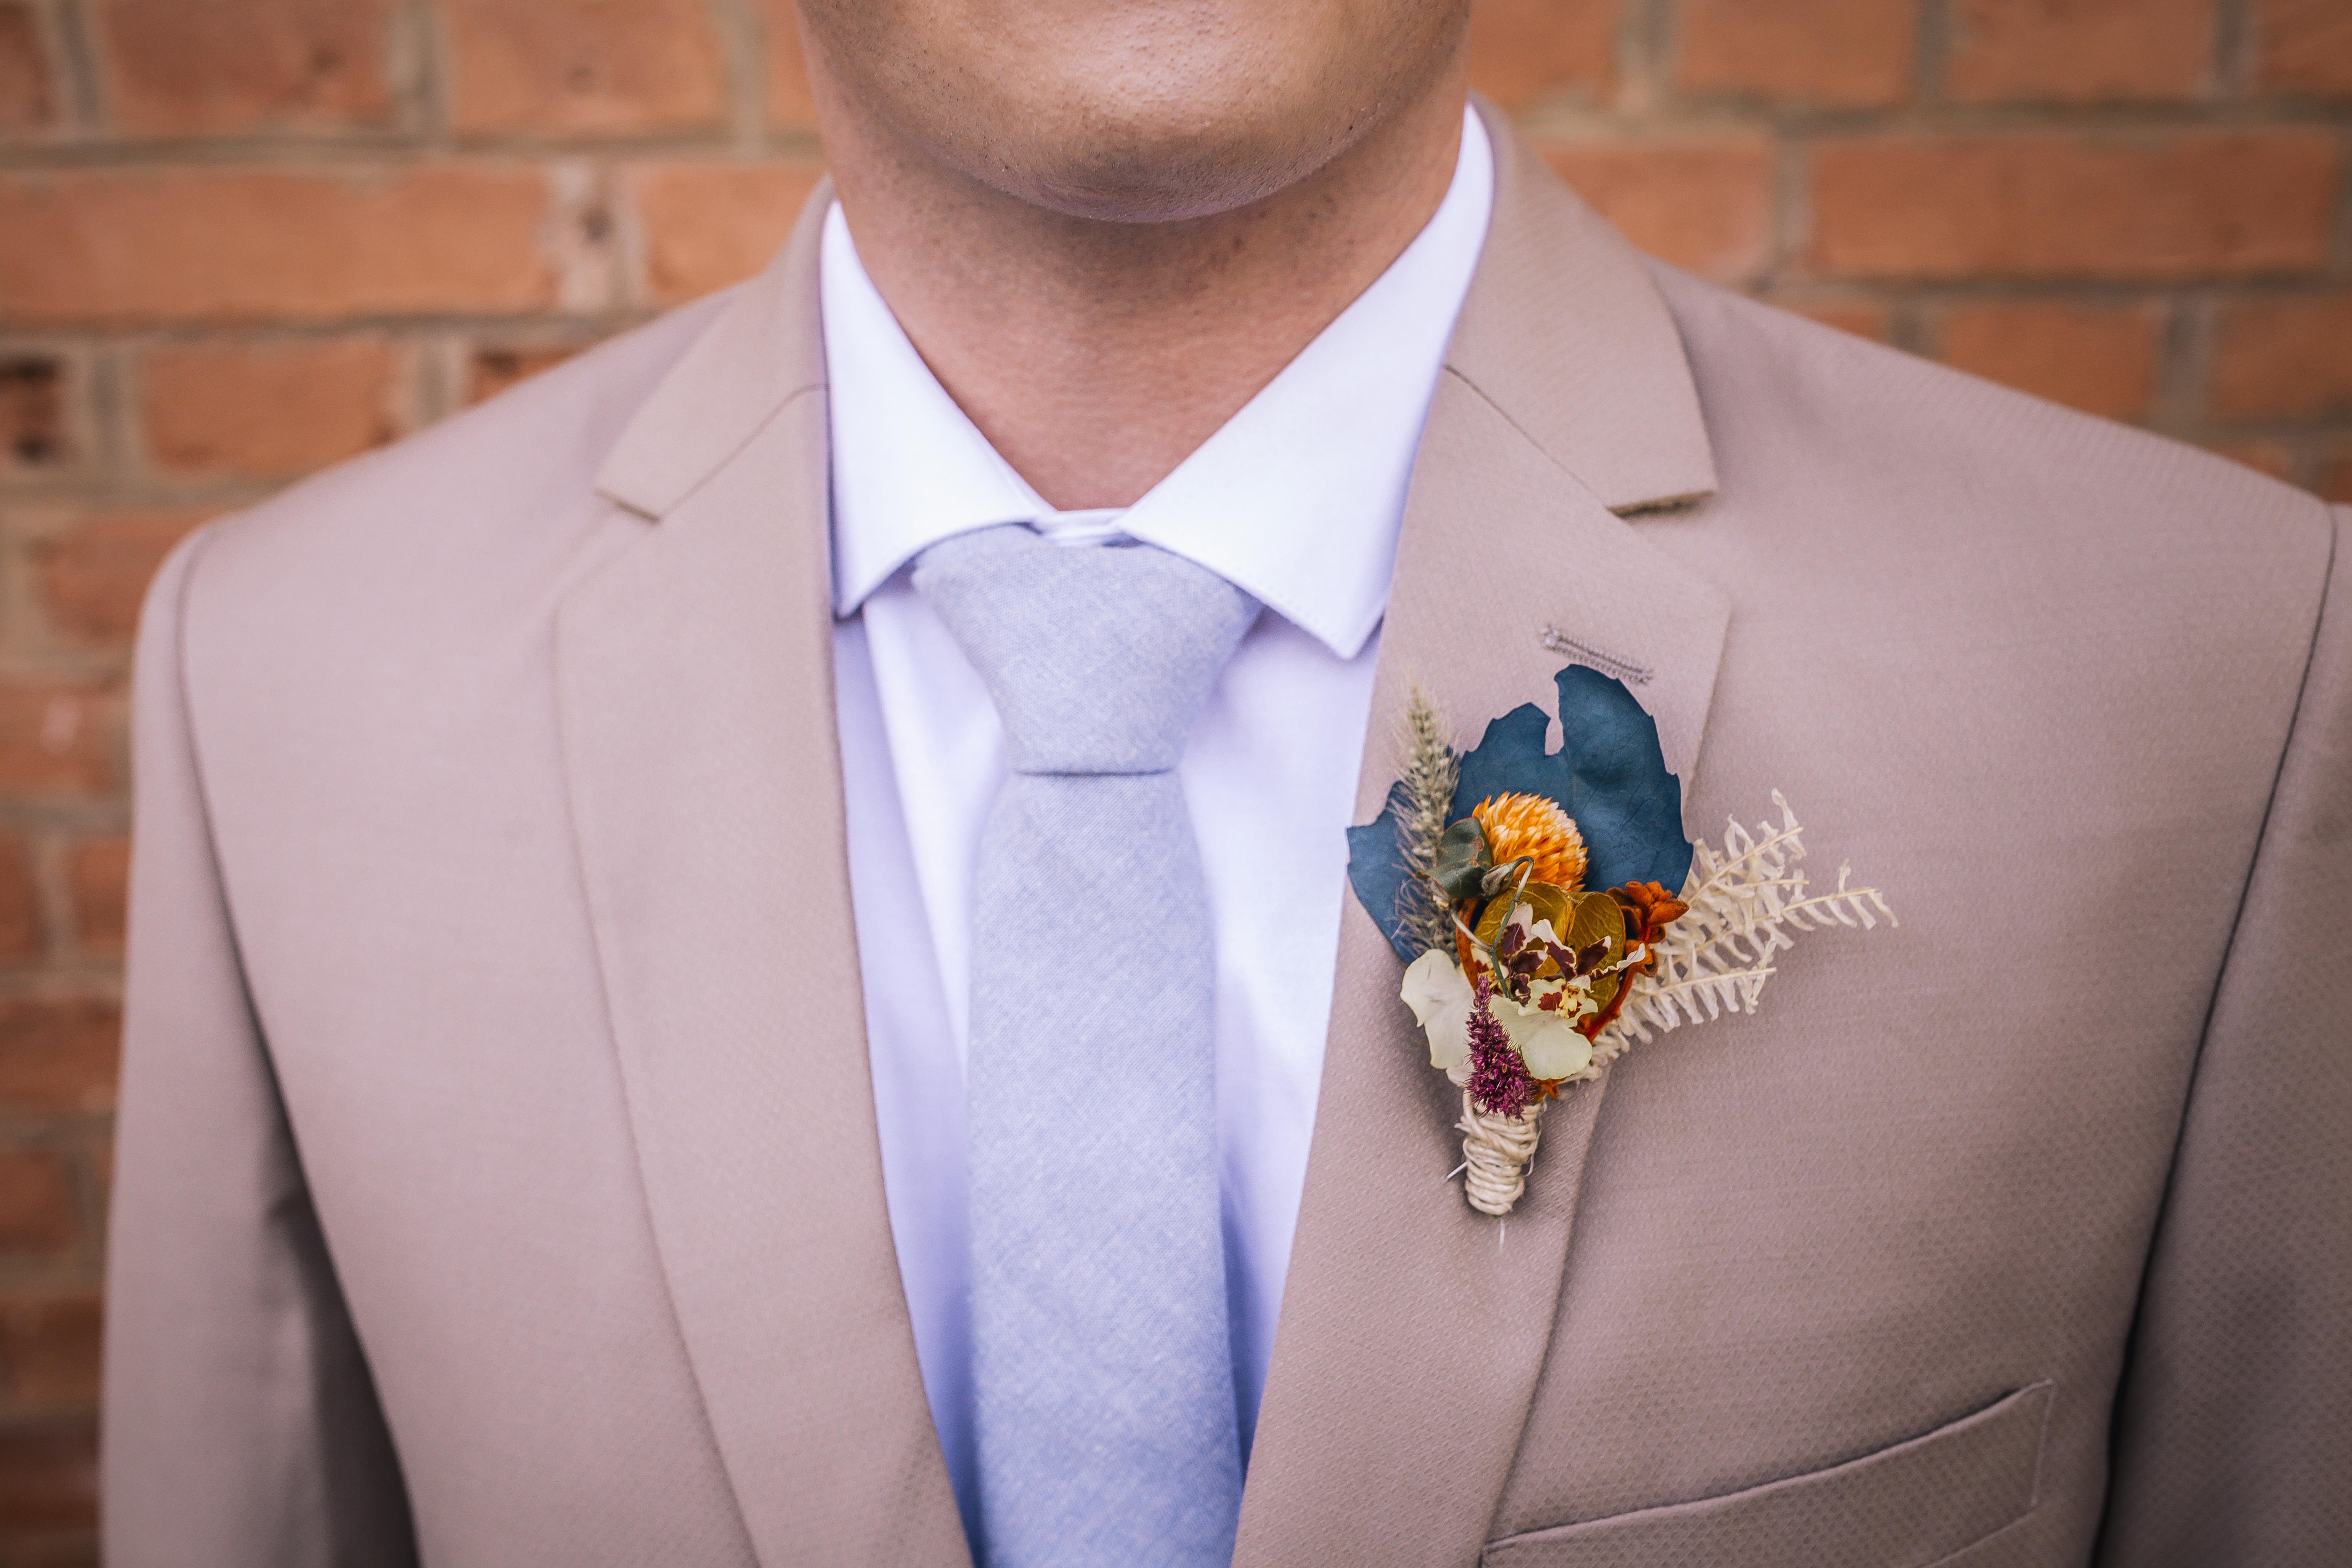 terno bege com gravata azul